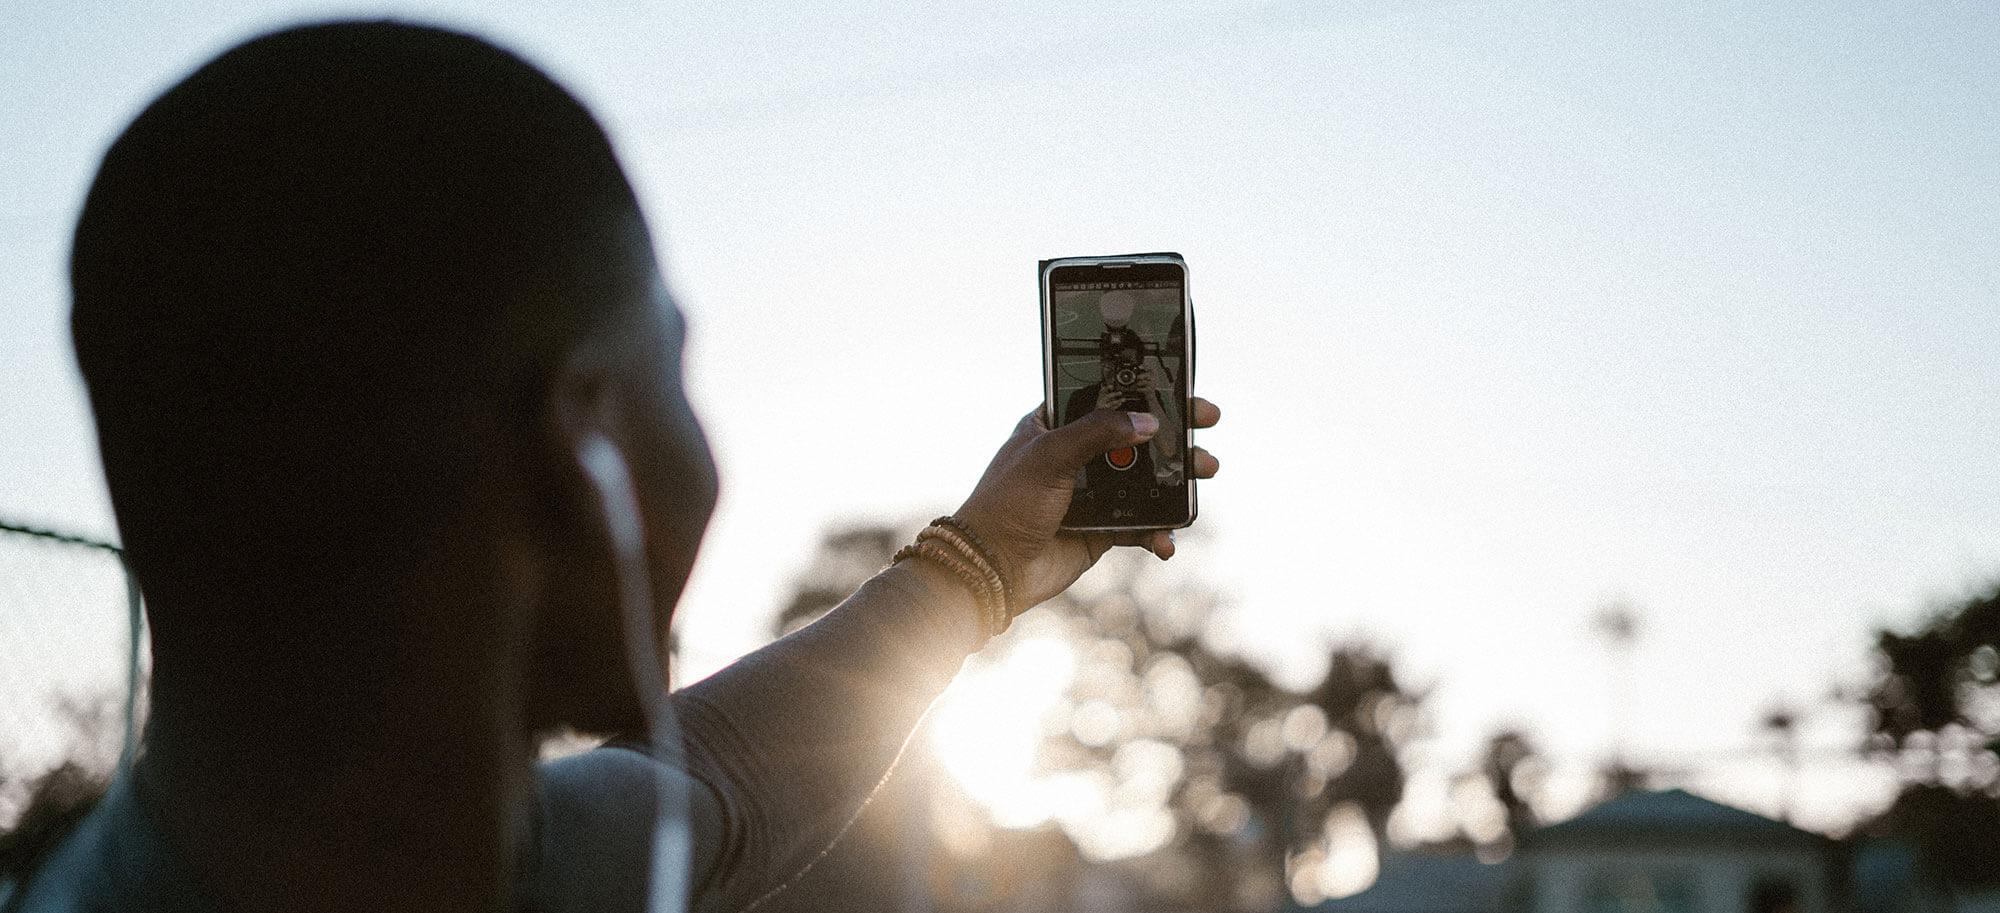 selfie banner - levi-elizaga-454770-unsplash.jpg